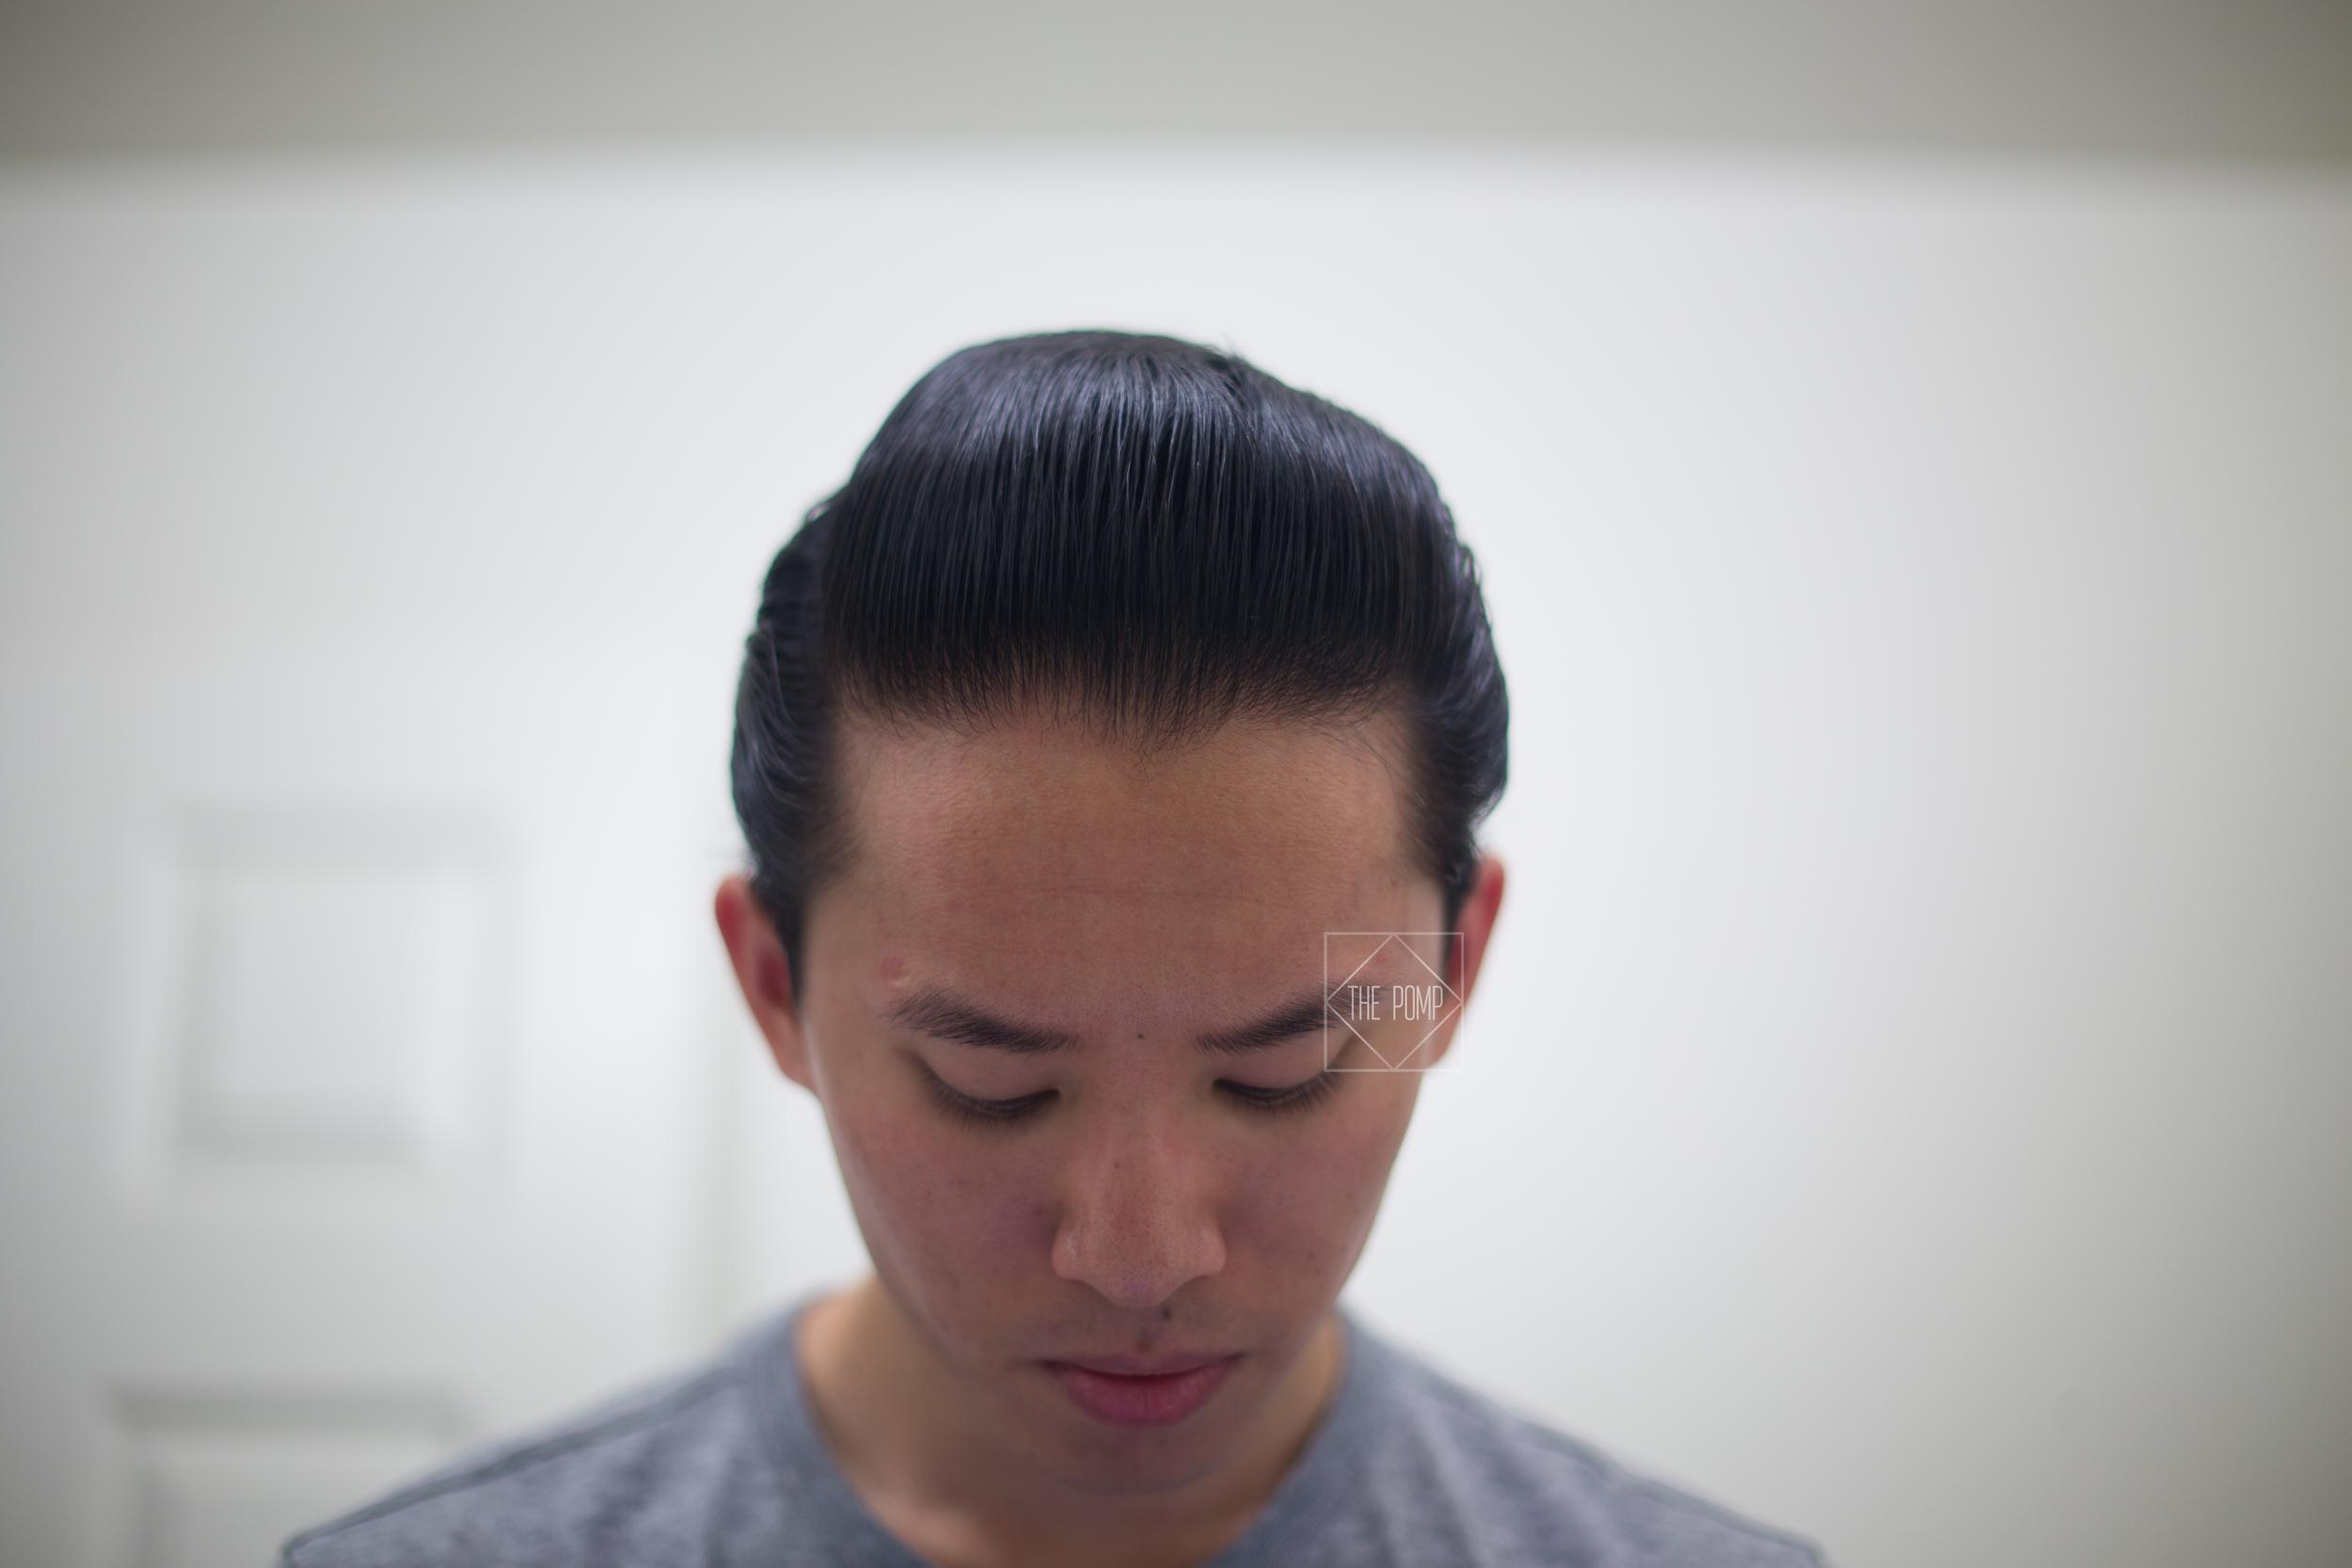 Uppercut Featherweight Hair Paste pomp